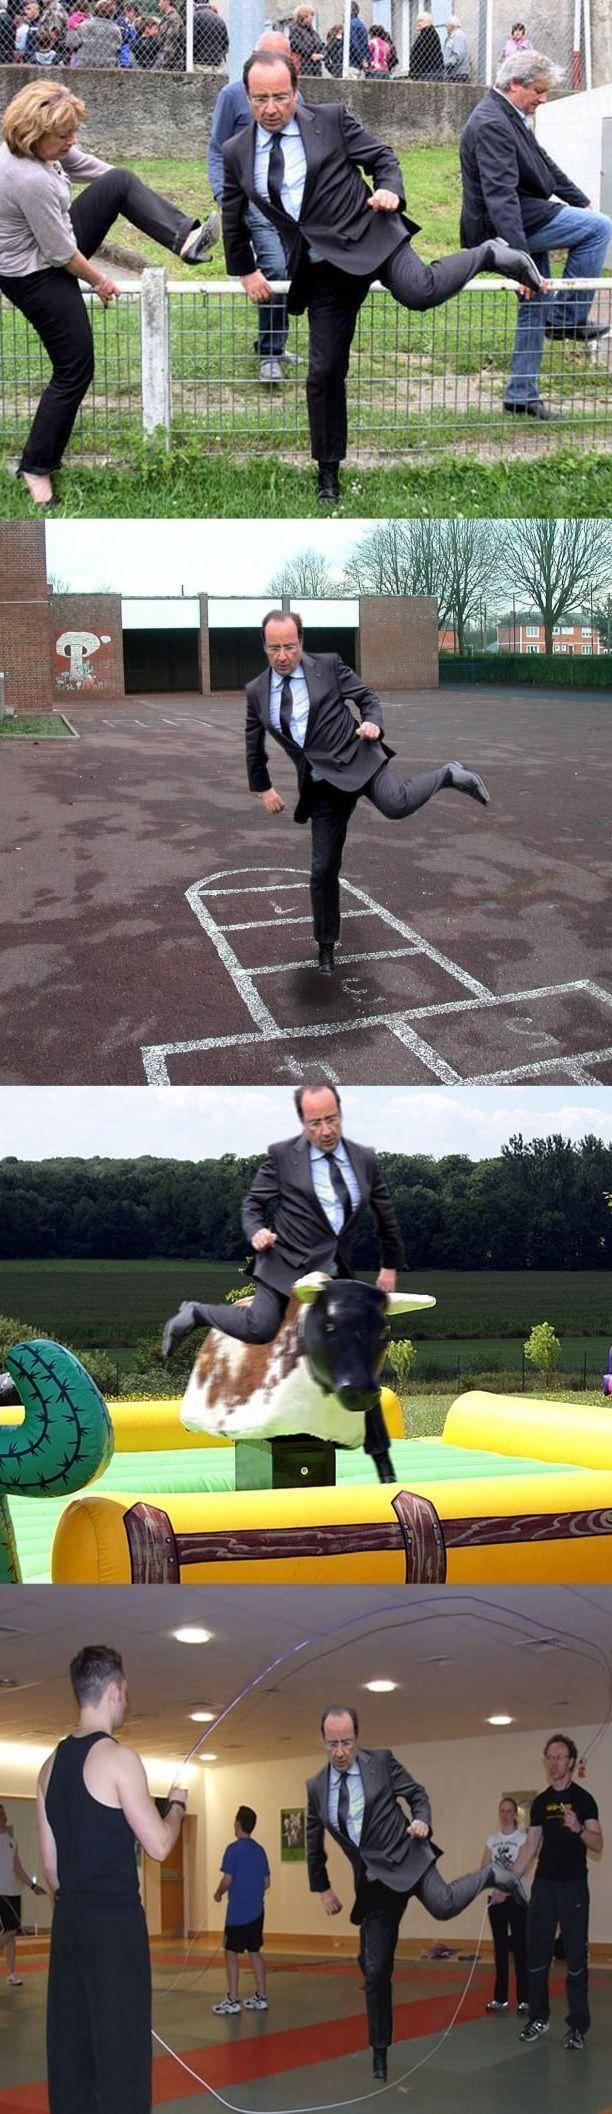 Francois Hollande feeling the quiche | 6Q4U